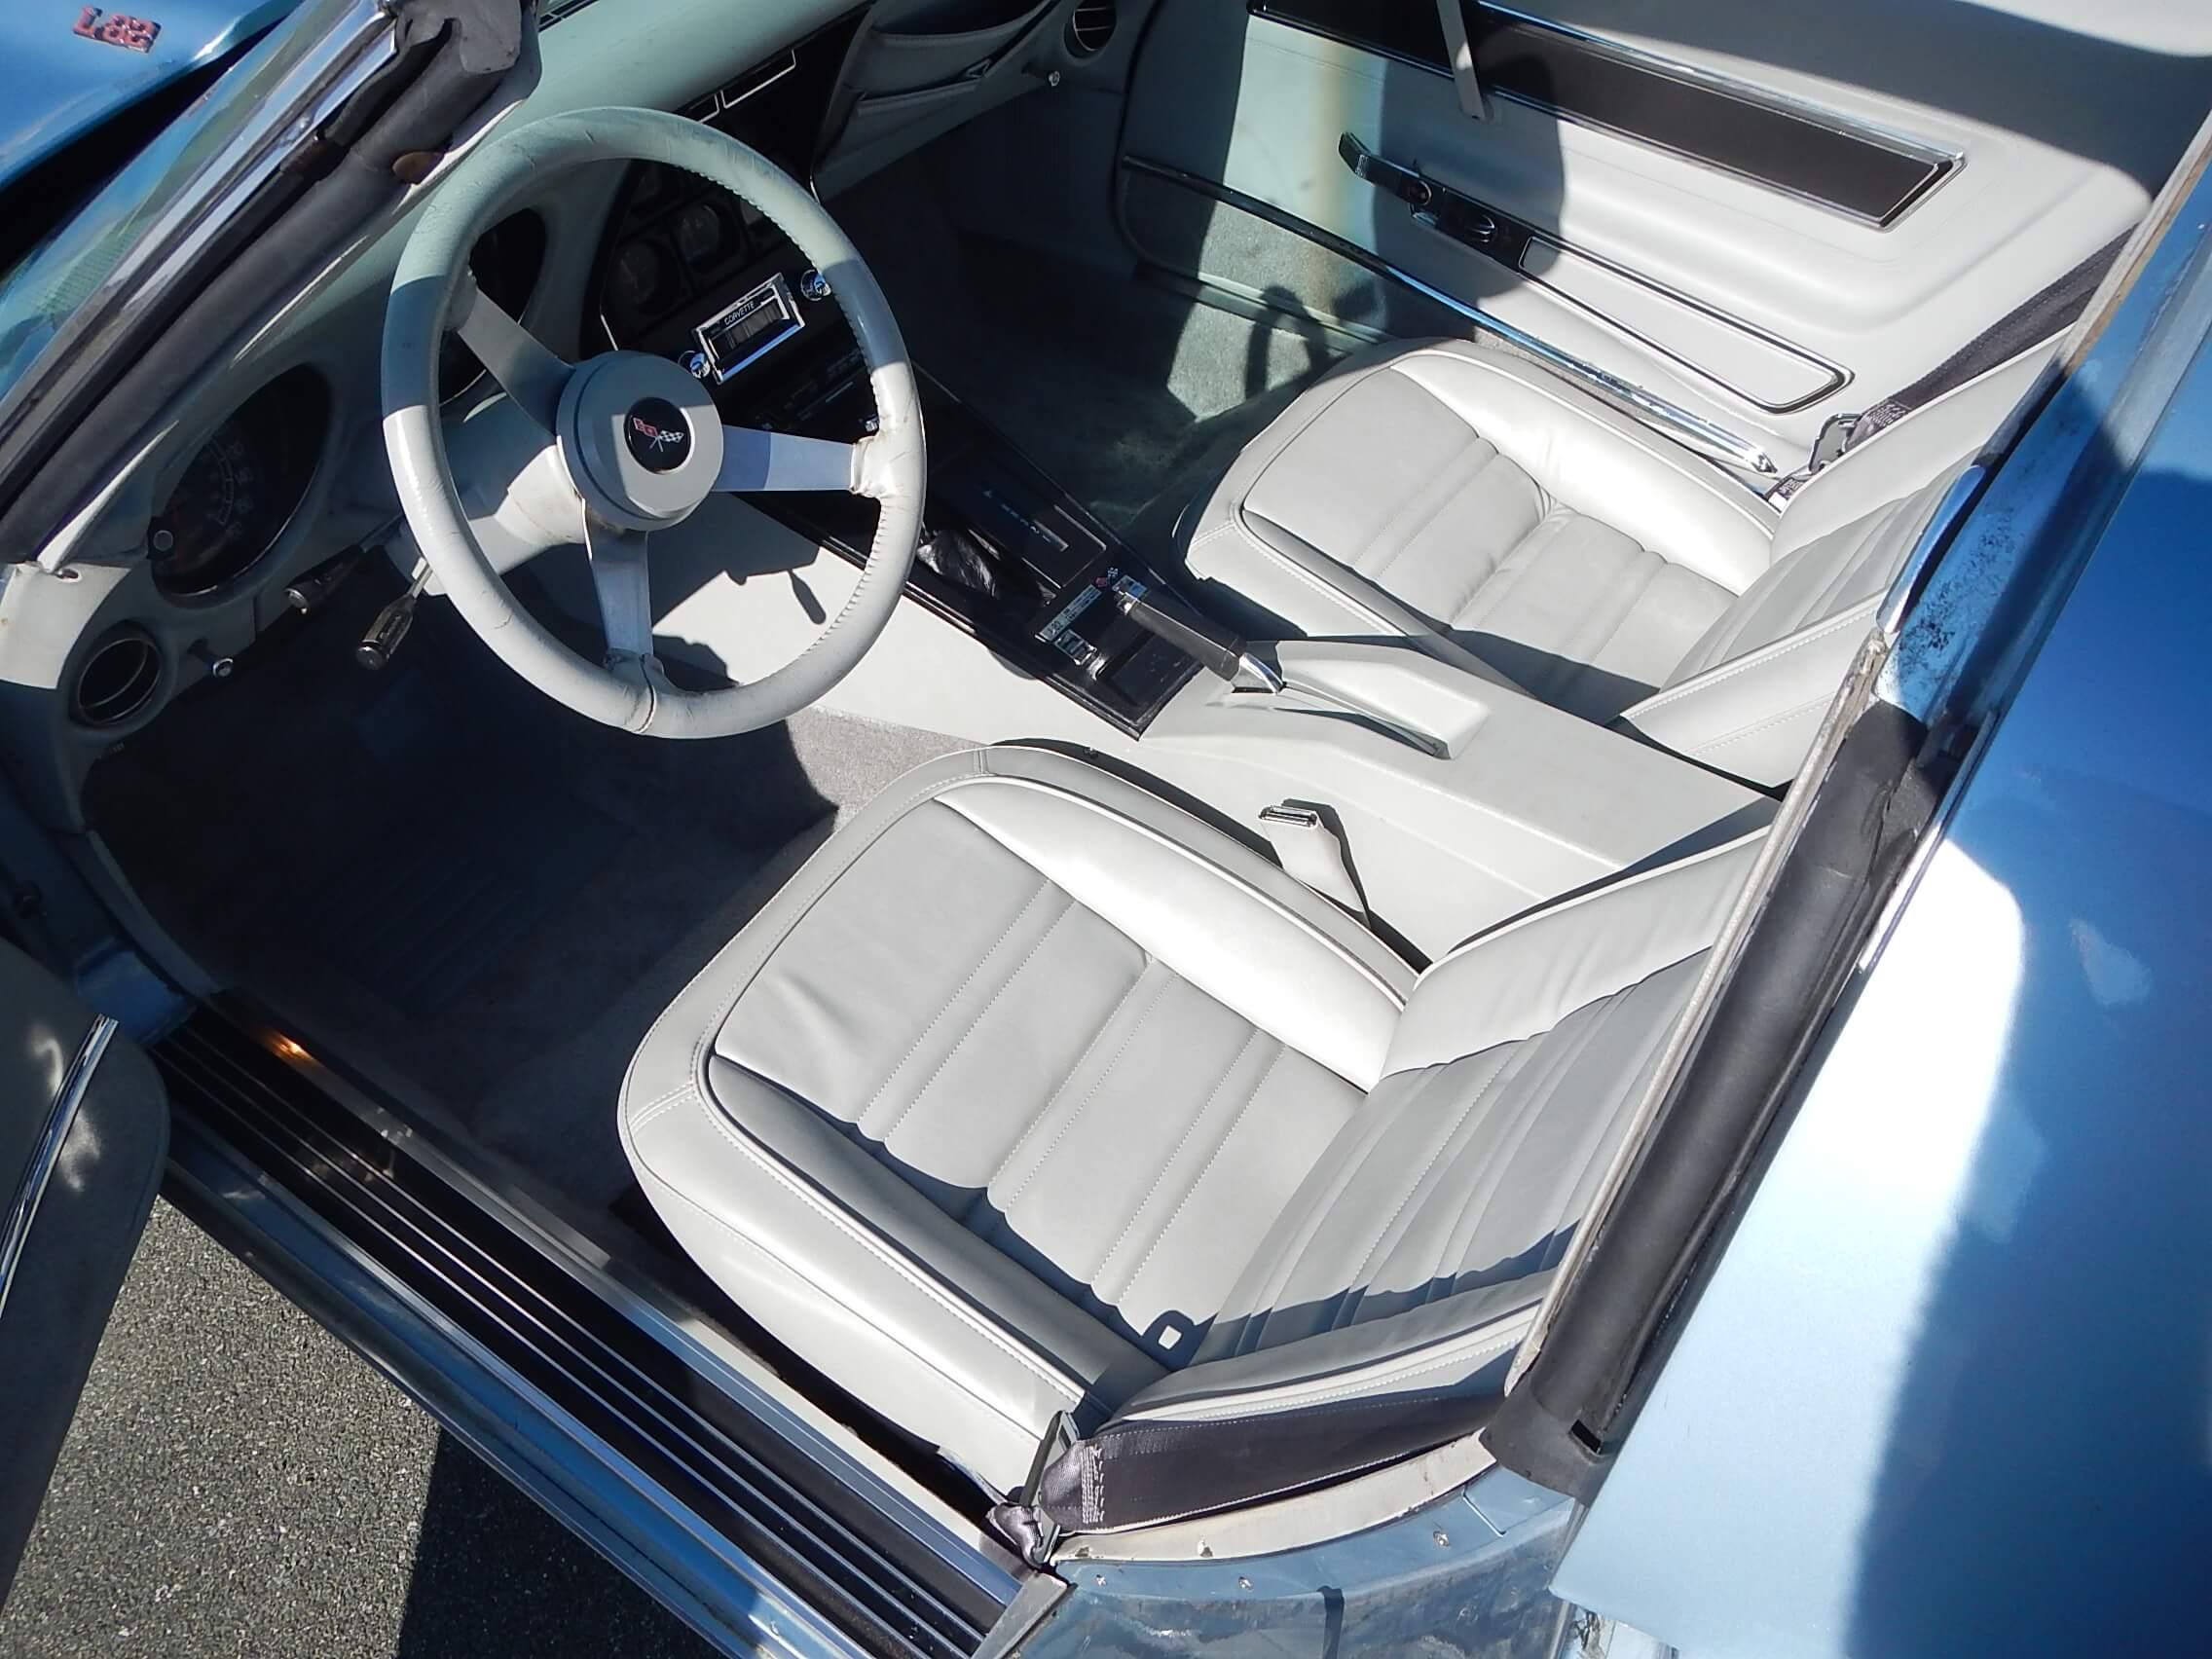 1977 Corvette Coupe restoration 68.JPG